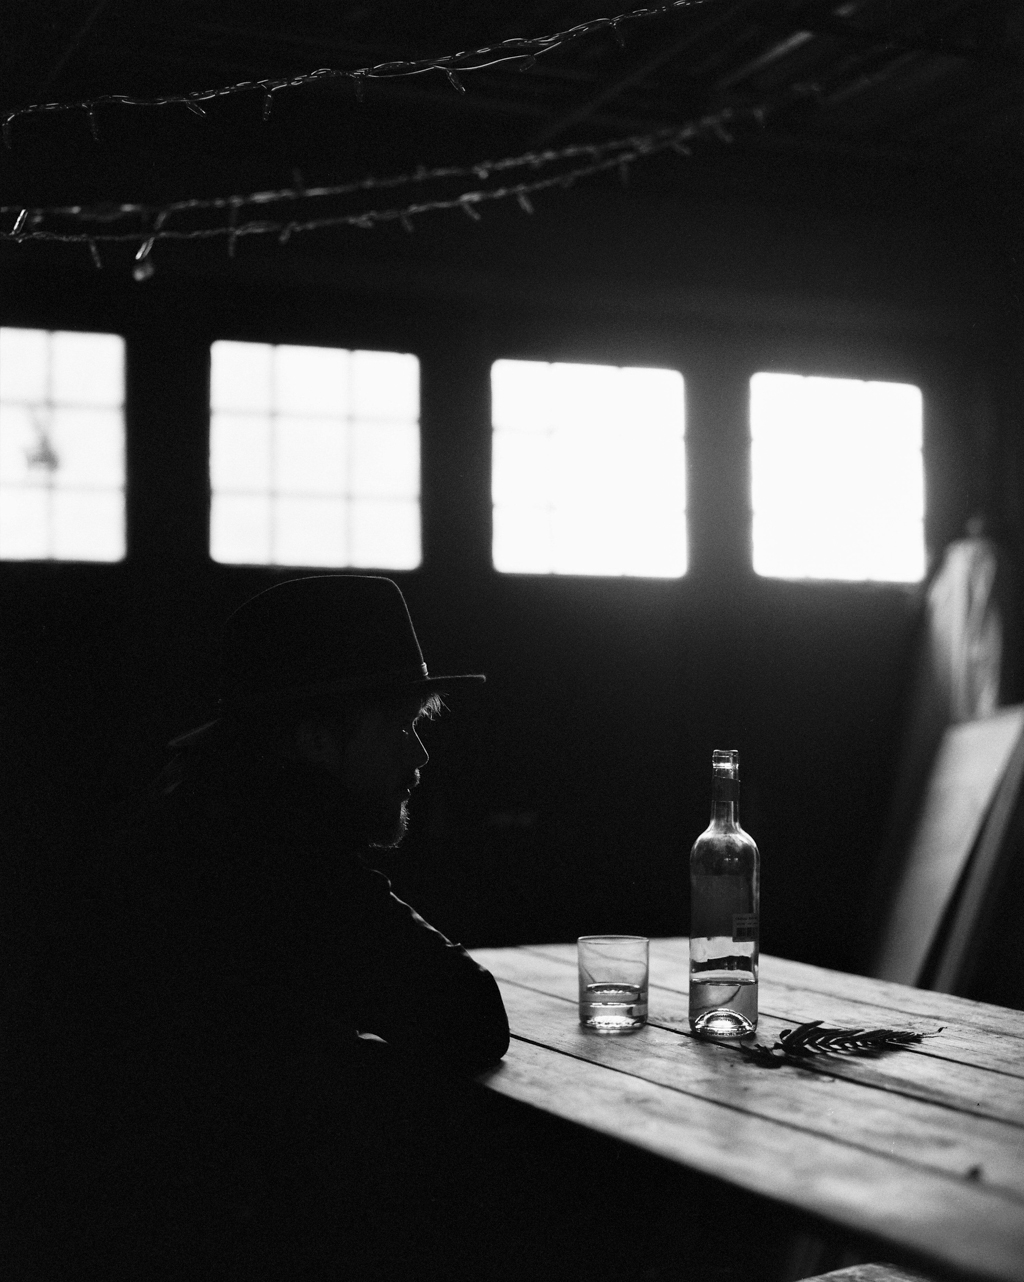 capyture-photographe-alsace-haut-rhin-91